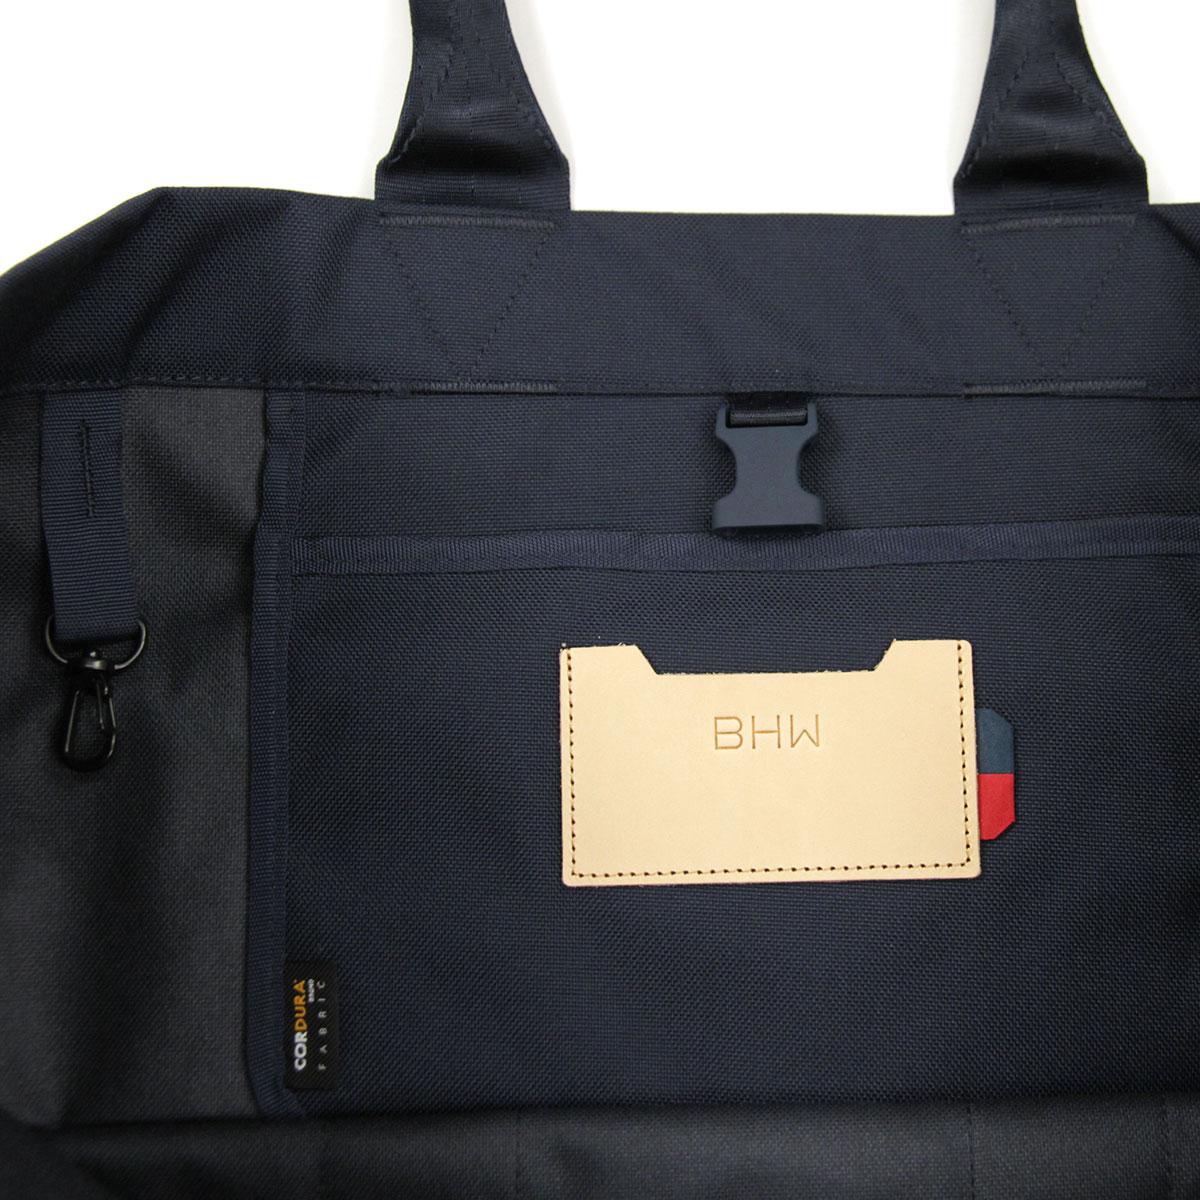 f0dbb6e333 Hershel supply Herschel Supply regular store bag tote bag H-445 TOTE BAG  BHW 10418-01982-OS PEACOAT